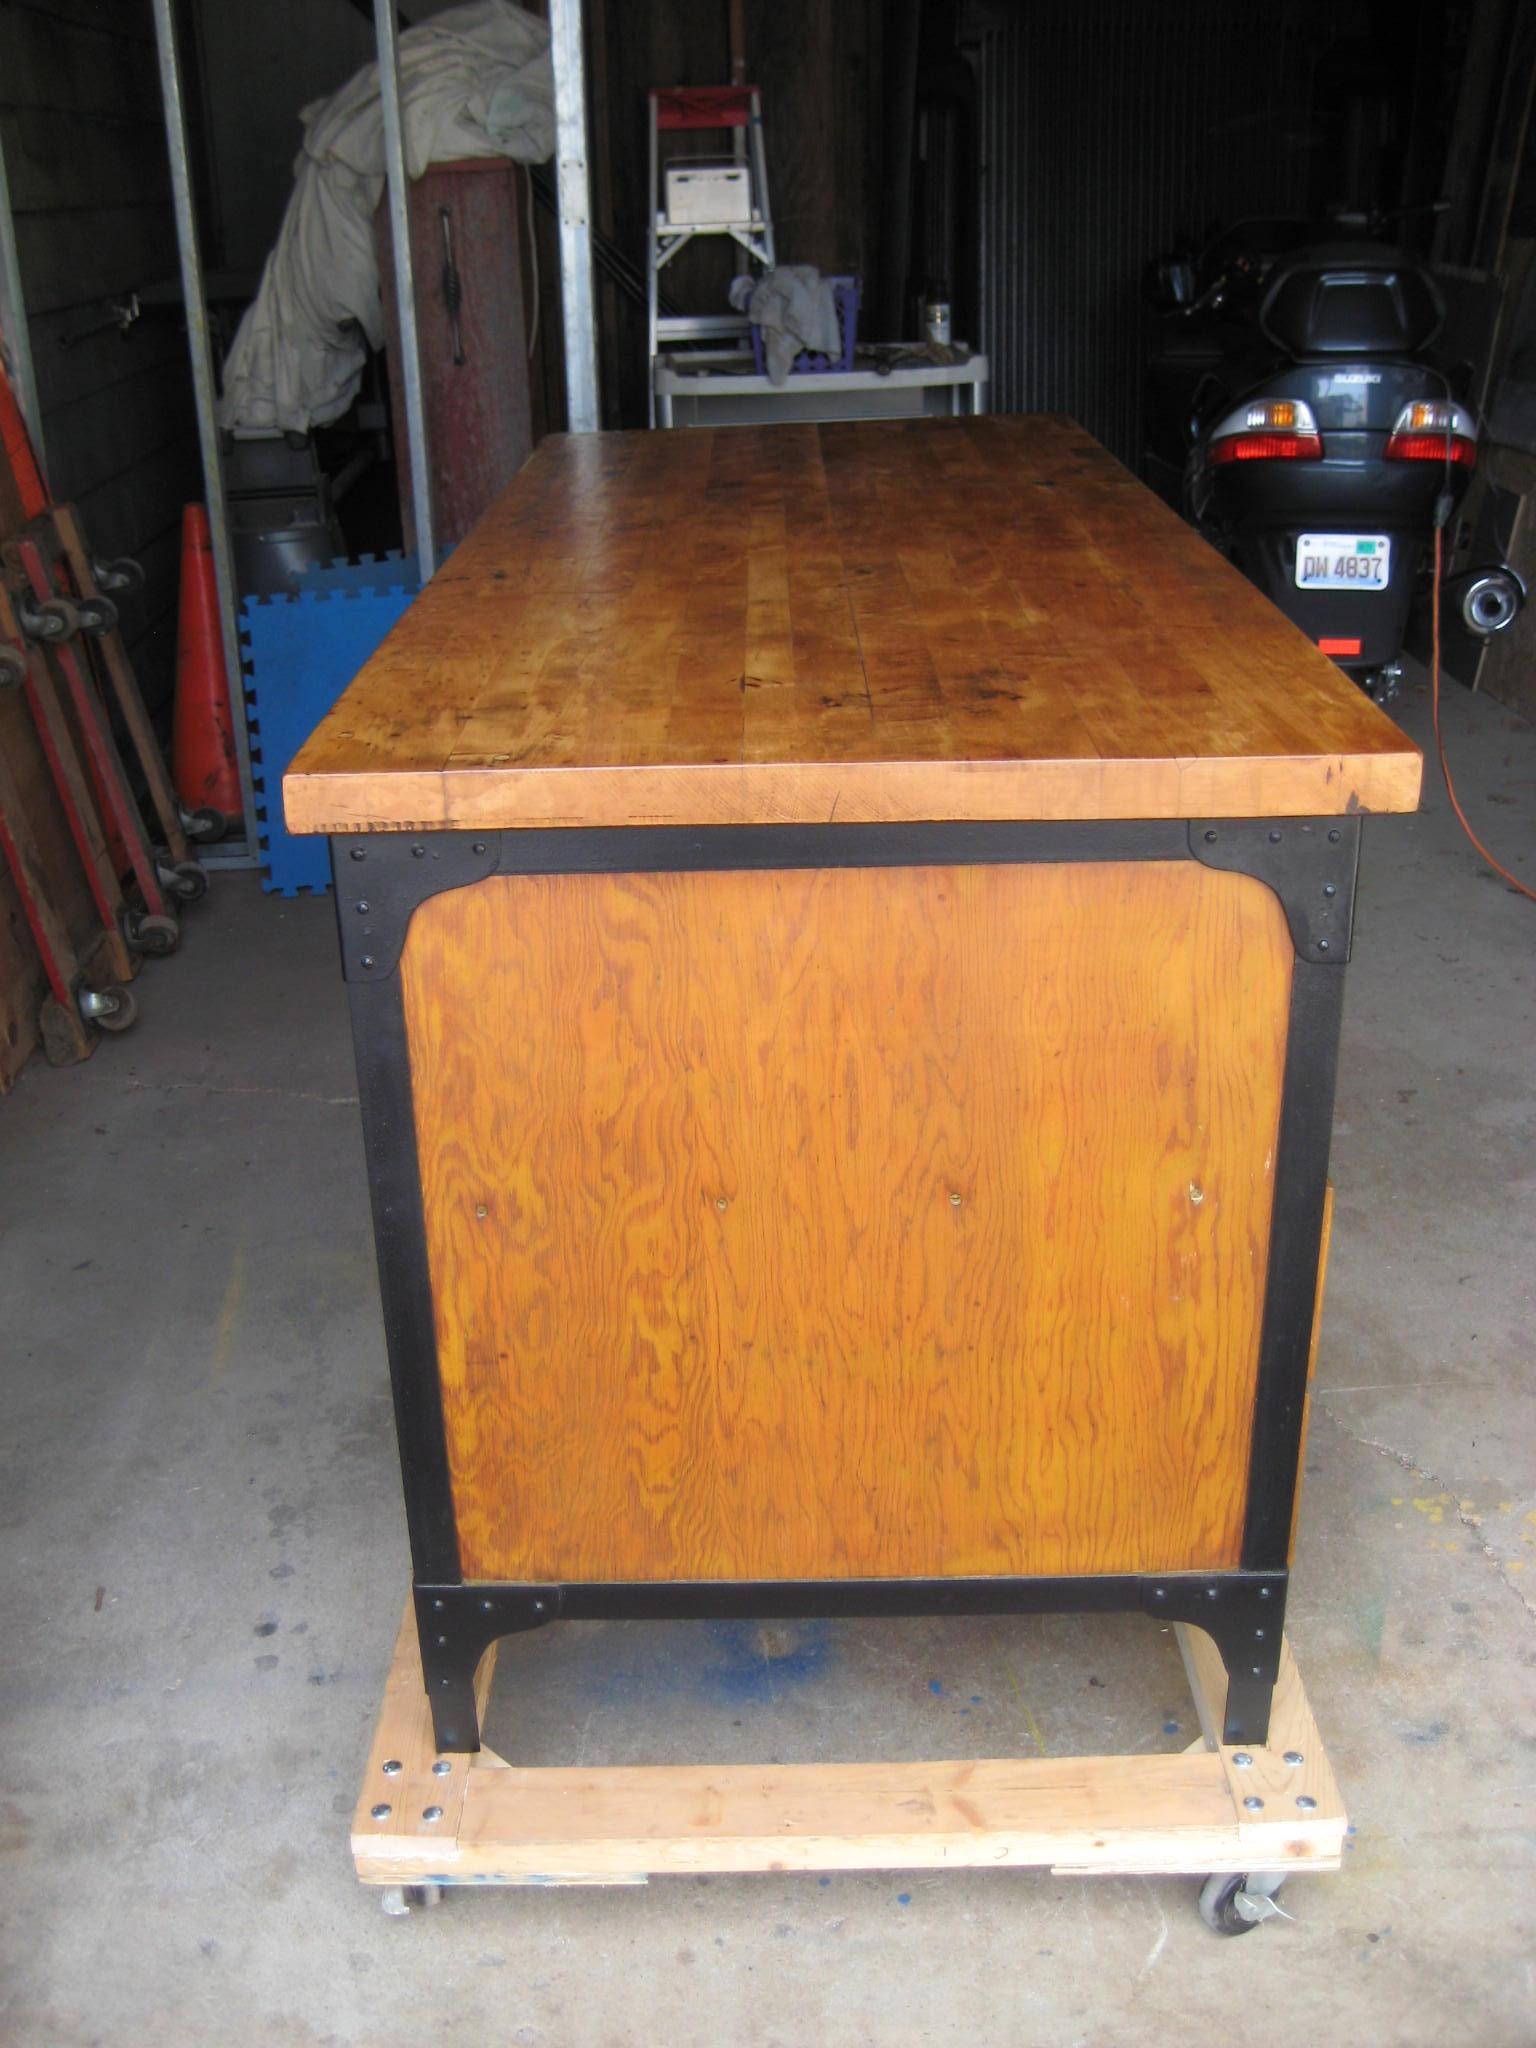 Astounding Vintage Industrial Work Bench For Sale Antiques Com Frankydiablos Diy Chair Ideas Frankydiabloscom